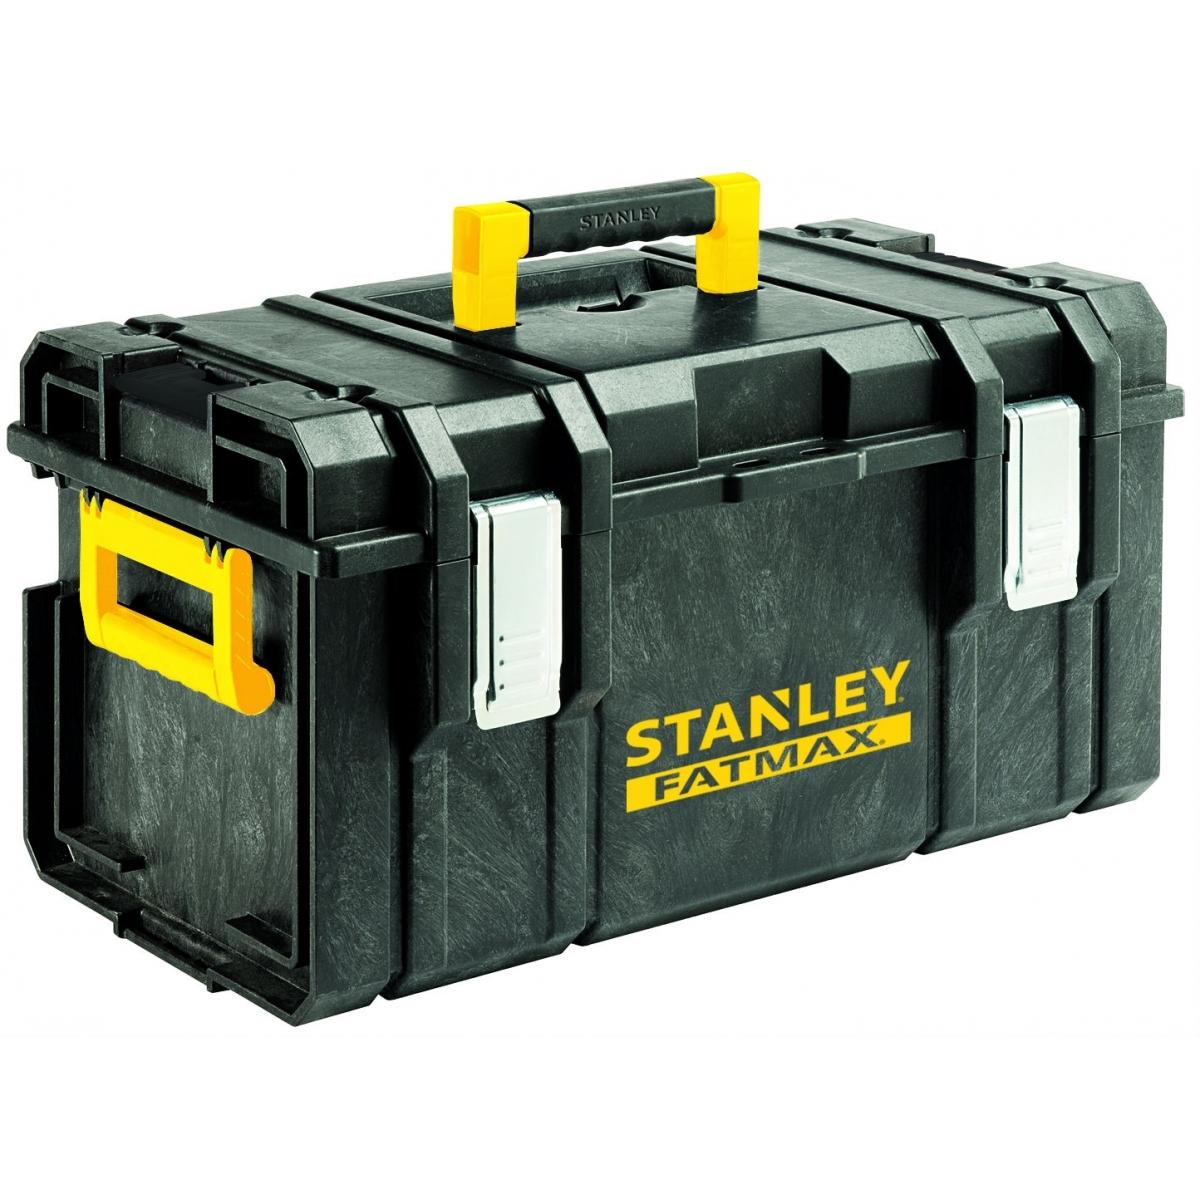 Box DS300 Toughsystem FatMax Stanley